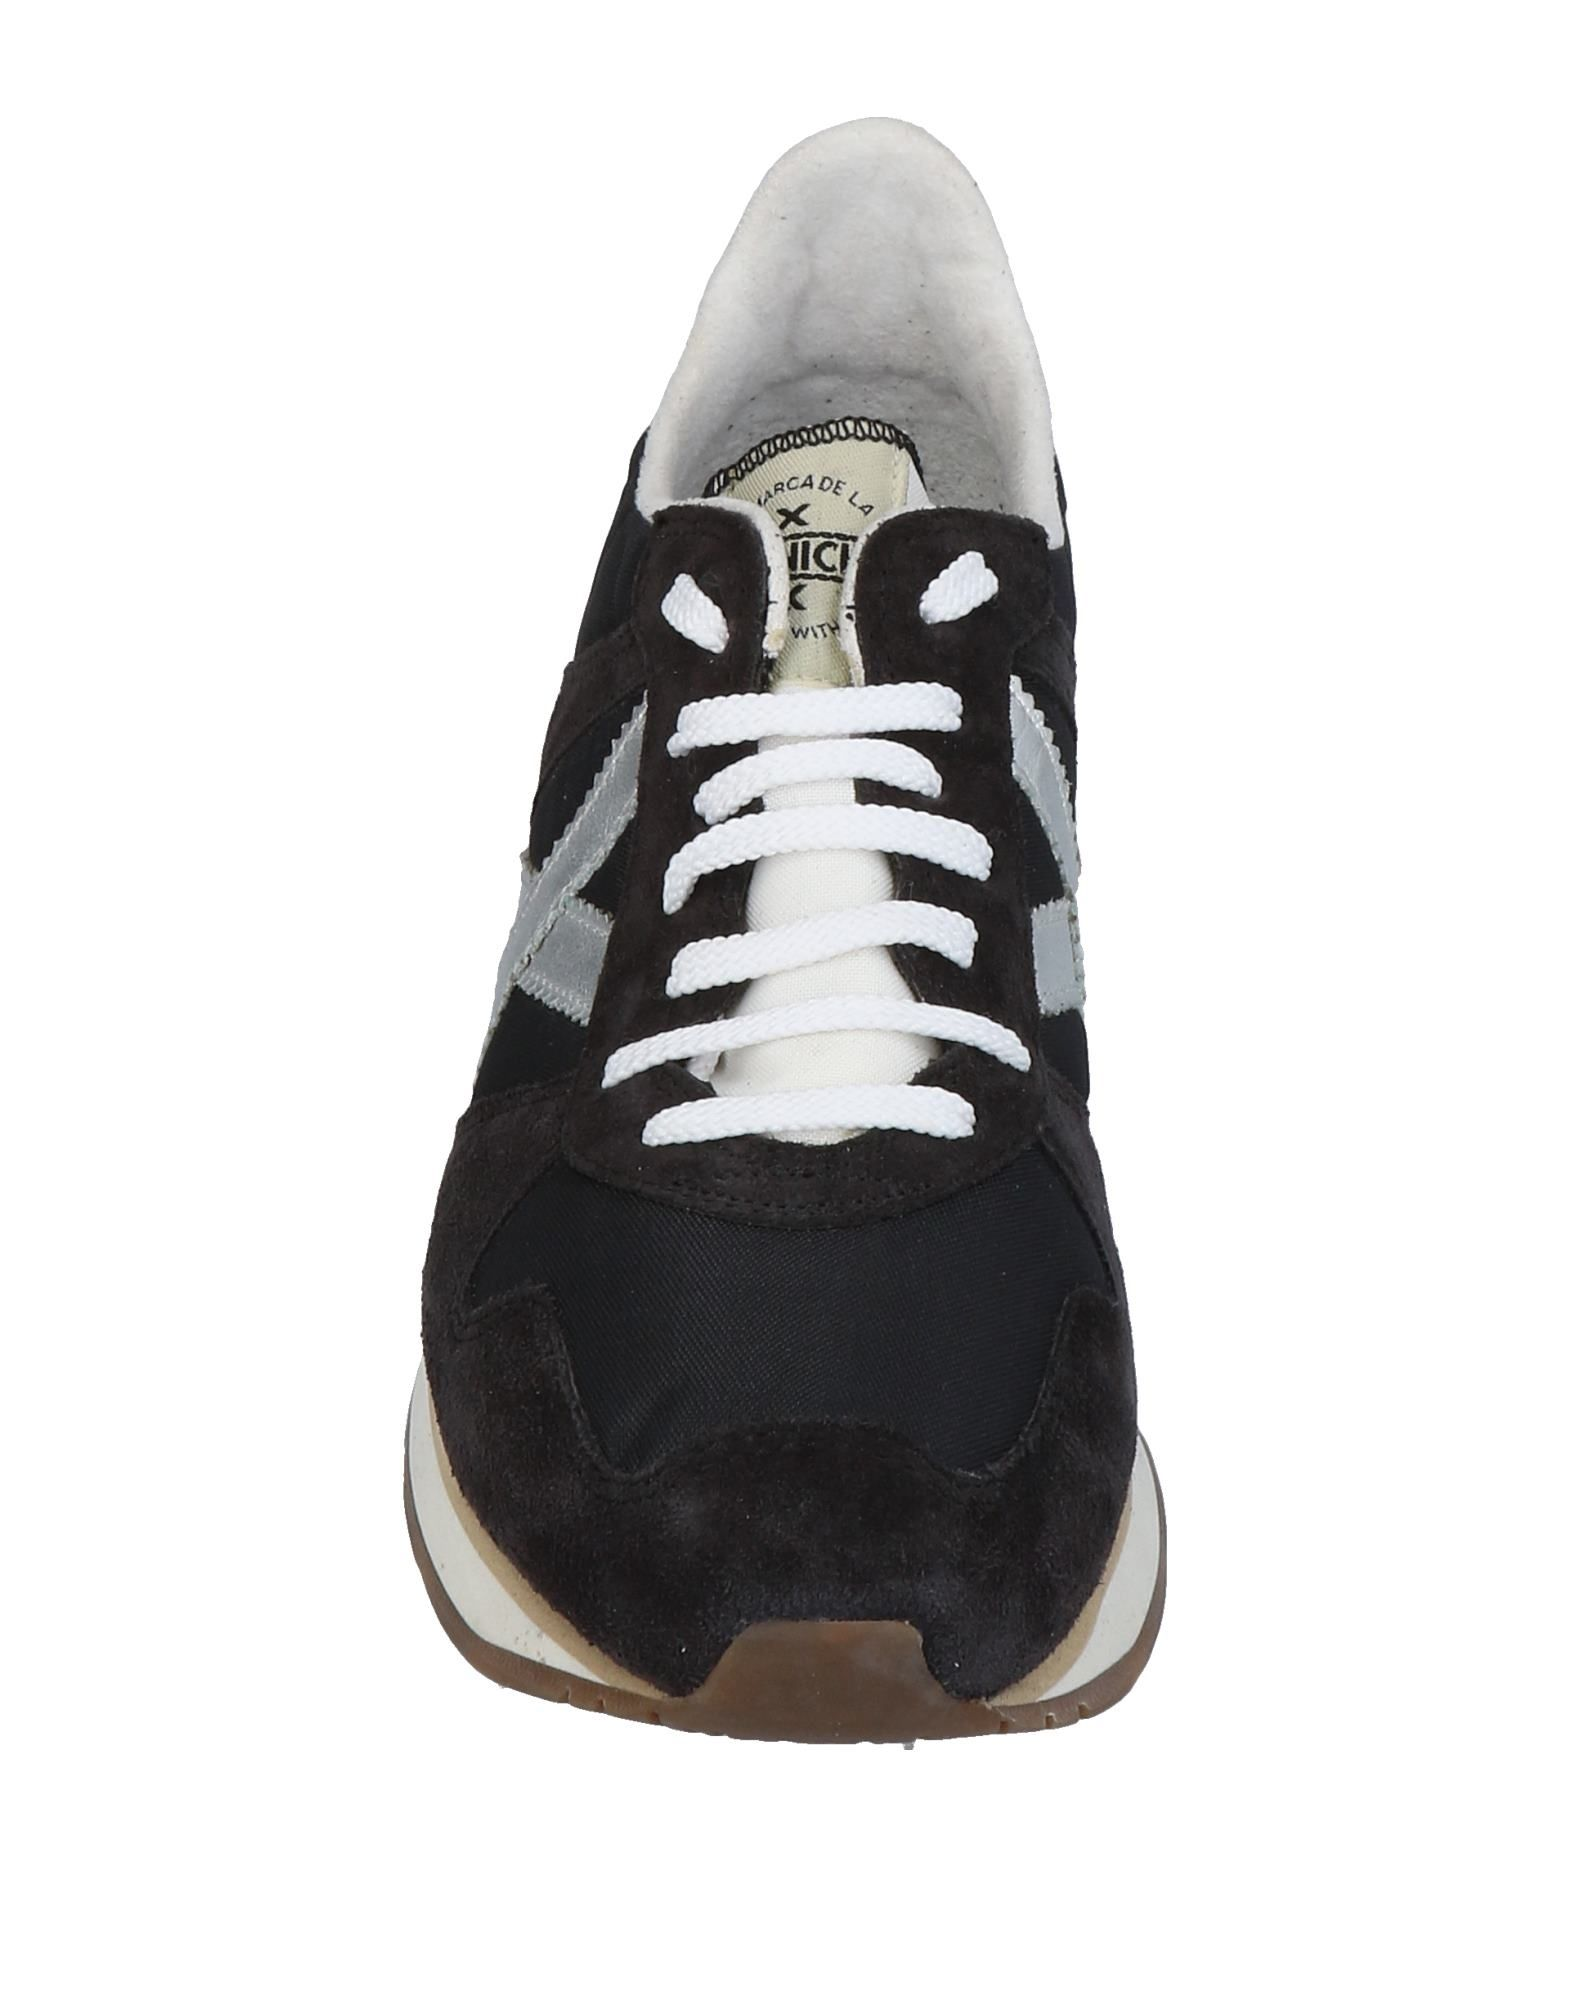 Rabatt Herren echte Schuhe Munich Sneakers Herren Rabatt  11454734KI 851930